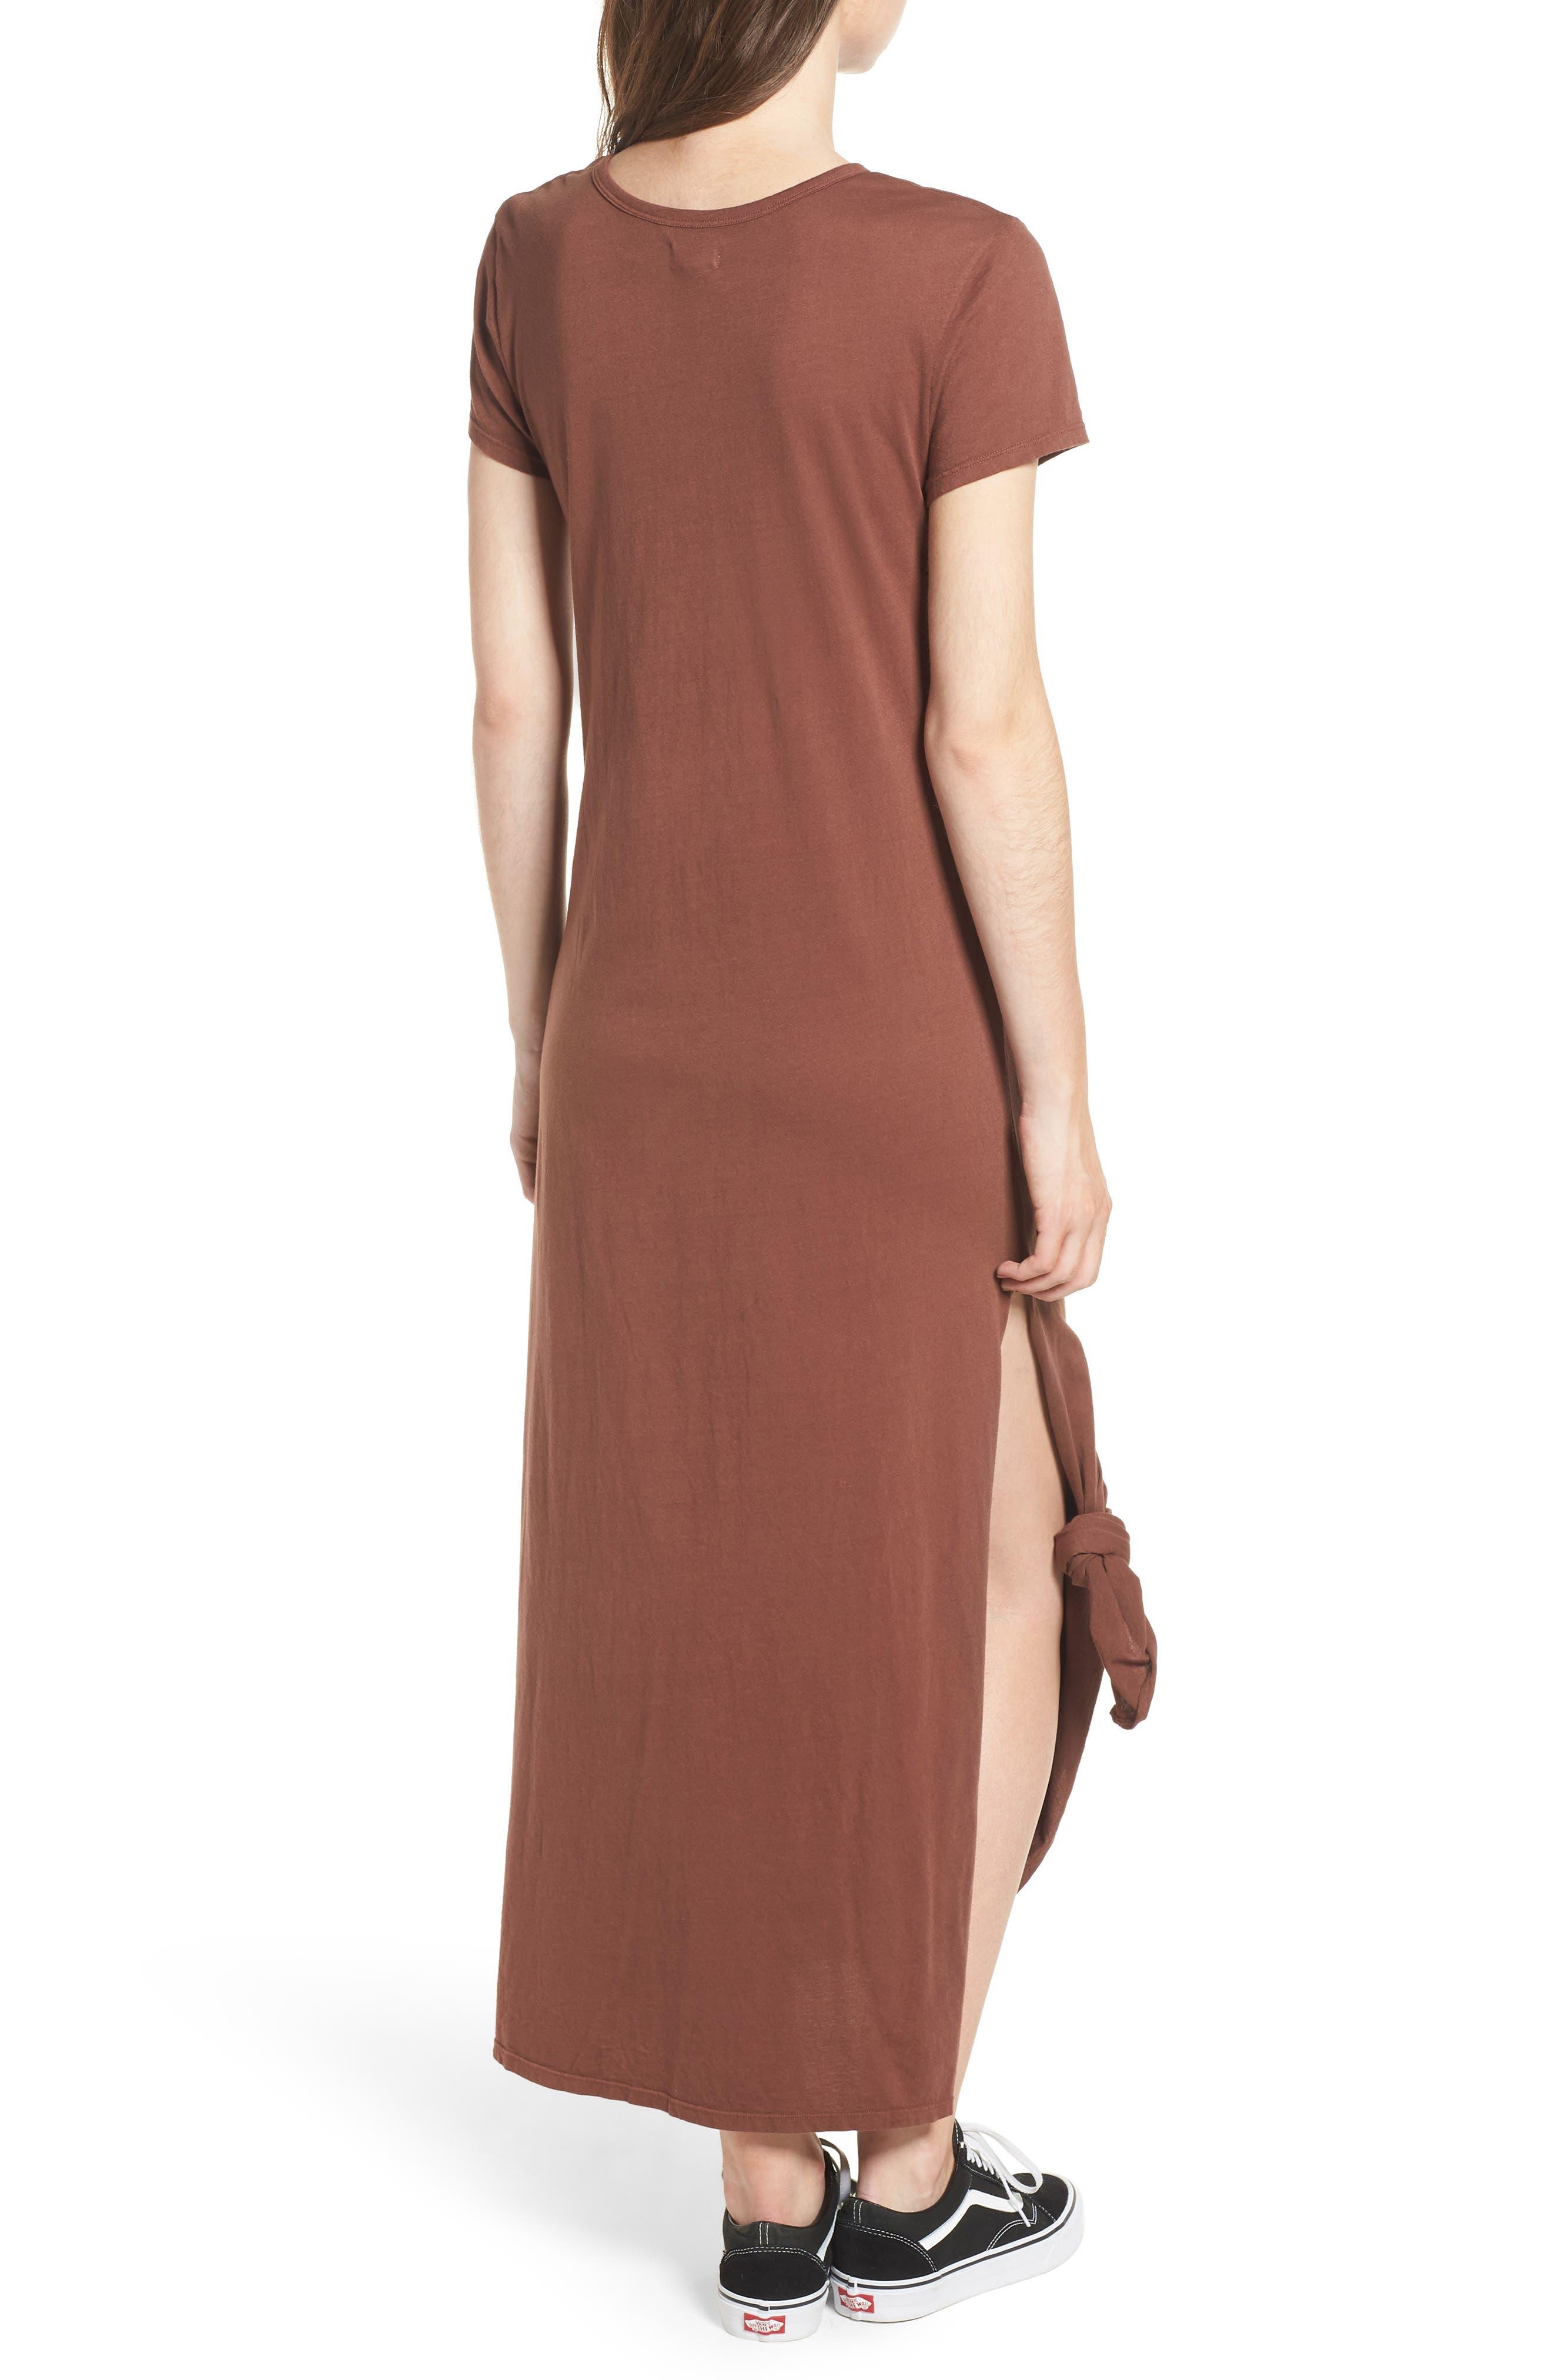 Alana Side Slit T-Shirt Dress,                             Alternate thumbnail 2, color,                             Nutmeg